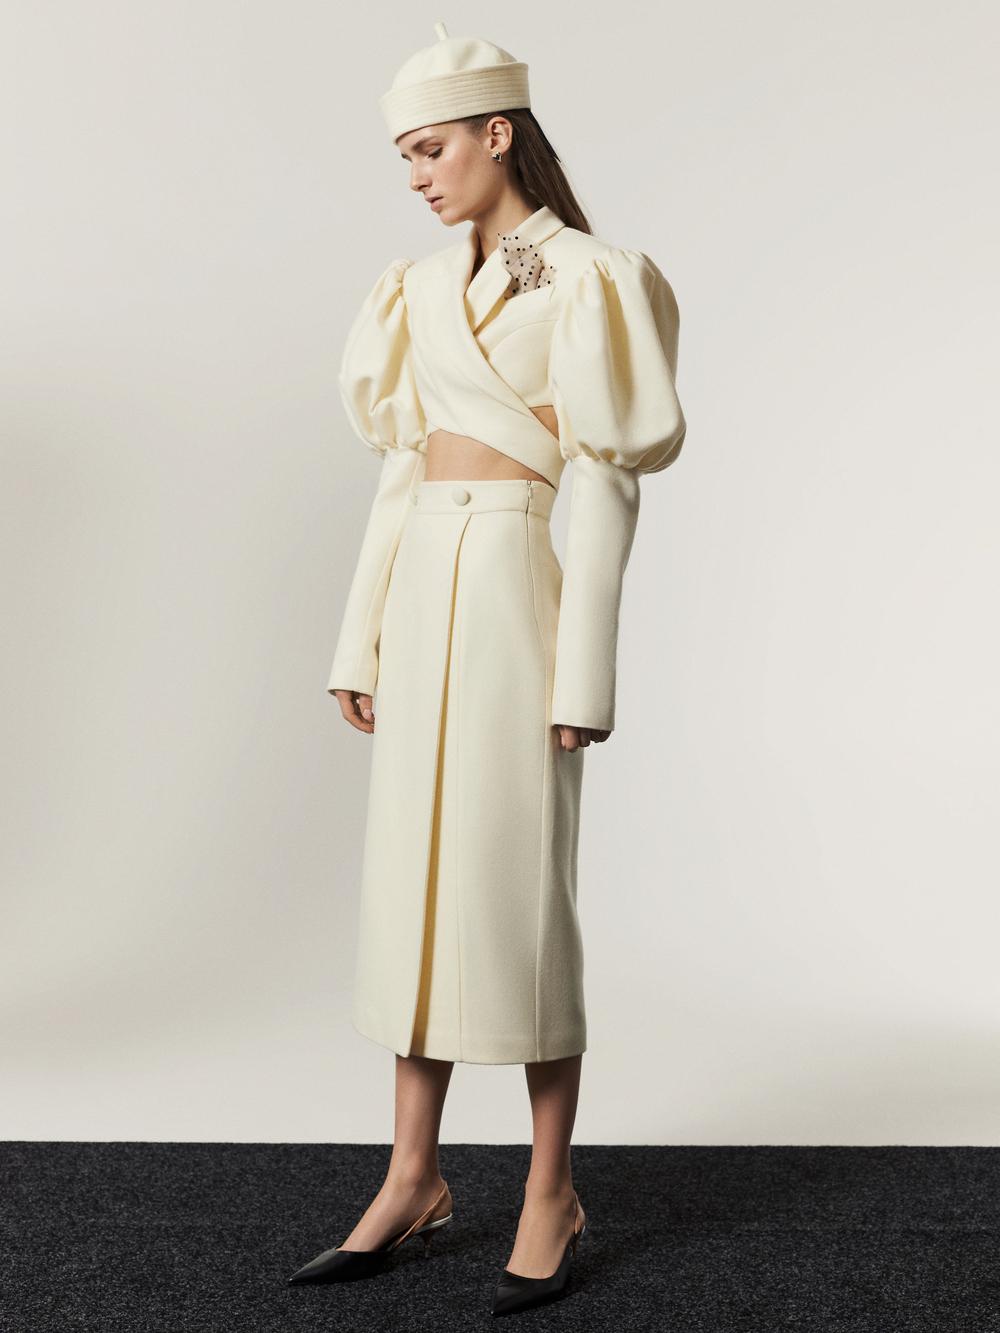 В стиле Жаклин Кеннеди: Украинский бренд Marianna Senchina презентовал коллекцию Fall-Winter 21/22-Фото 3